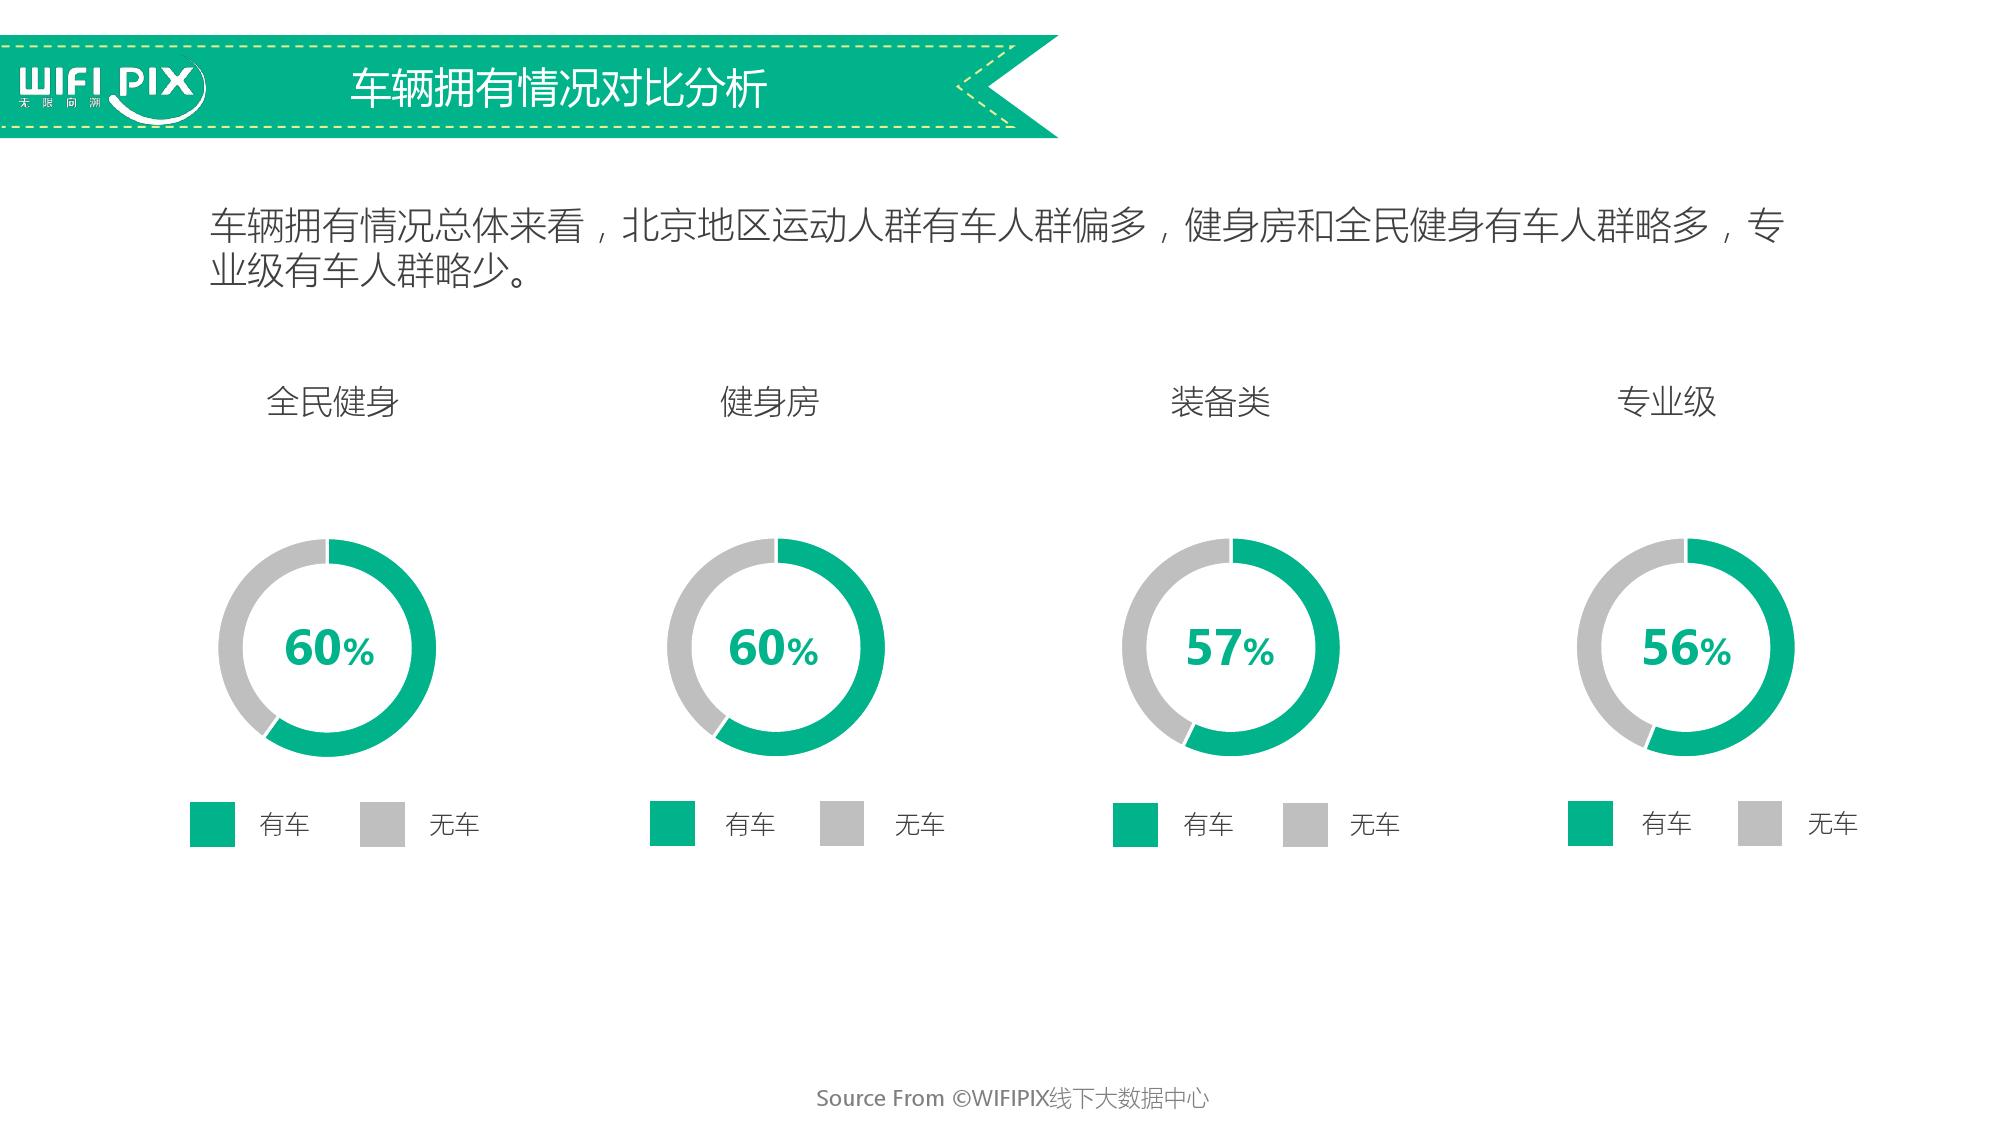 2016%e5%8c%97%e4%ba%ac%e4%bd%93%e8%82%b2%e8%bf%90%e5%8a%a8%e4%ba%ba%e7%be%a4%e6%95%b0%e6%8d%ae%e6%b4%9e%e5%af%9f%e5%88%86%e6%9e%90%e6%8a%a5%e5%91%8a_000023